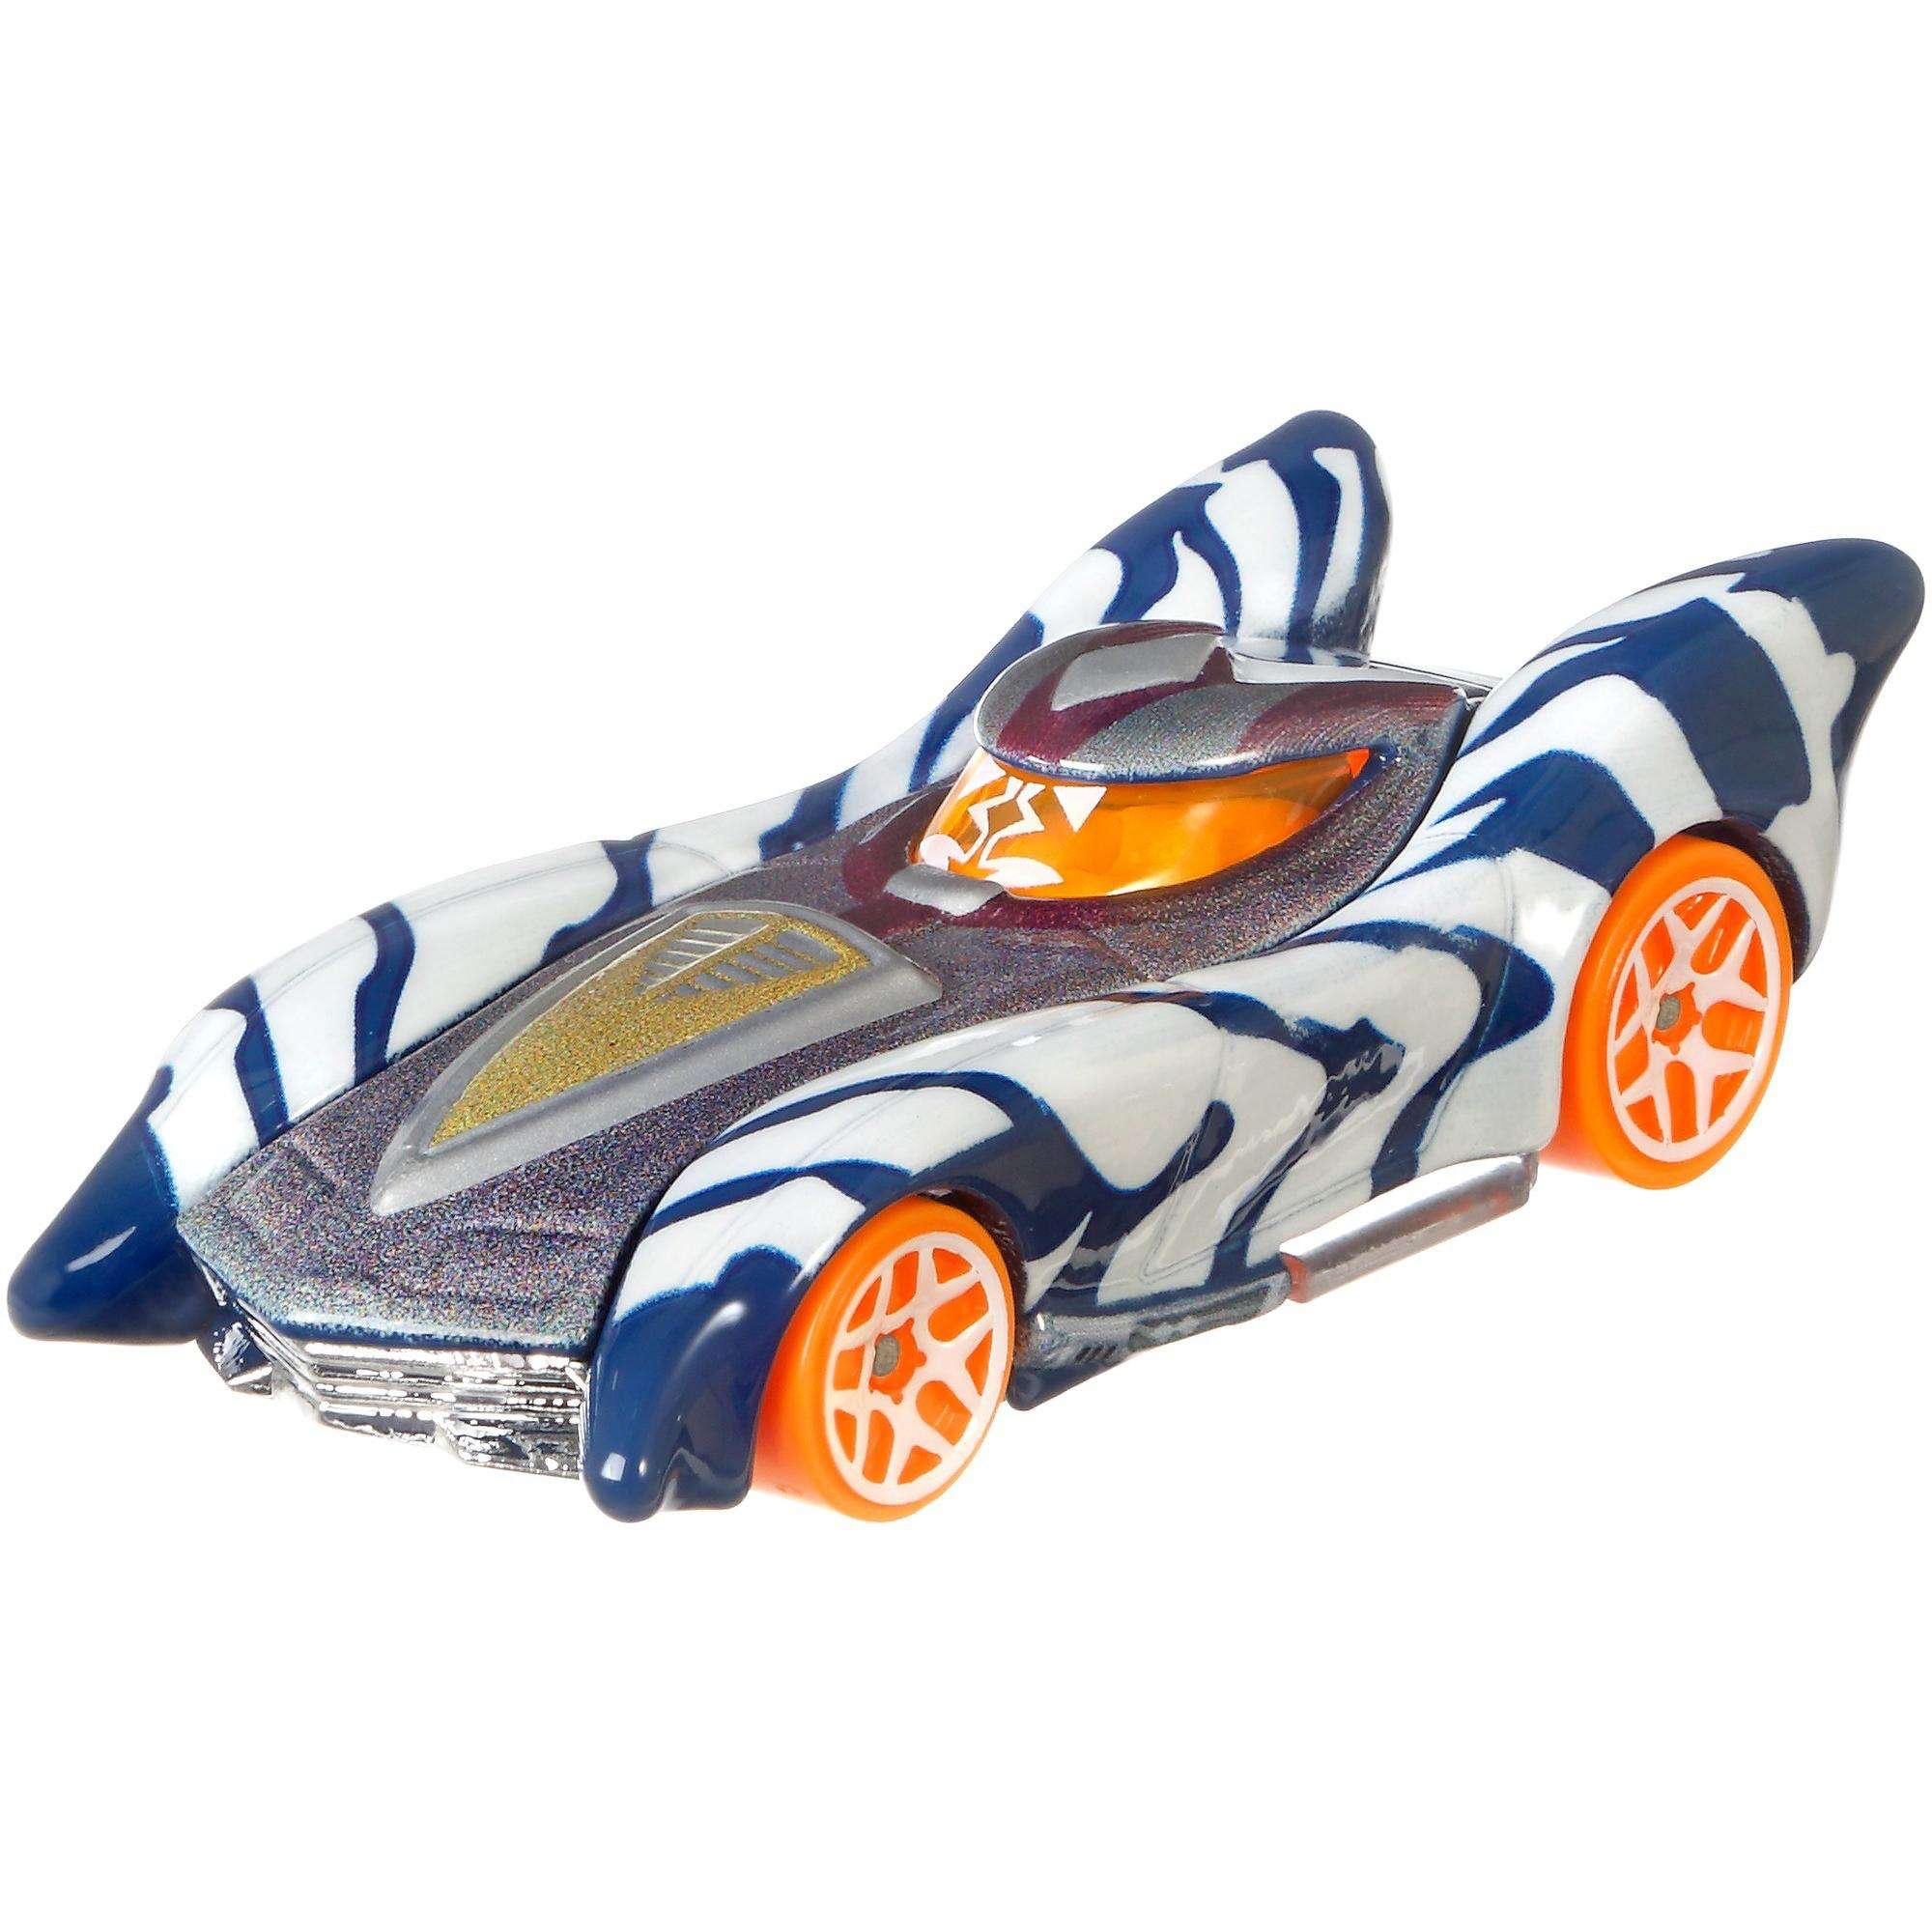 TLJ (SWR) Ahsoka Tano HW Character Car 3